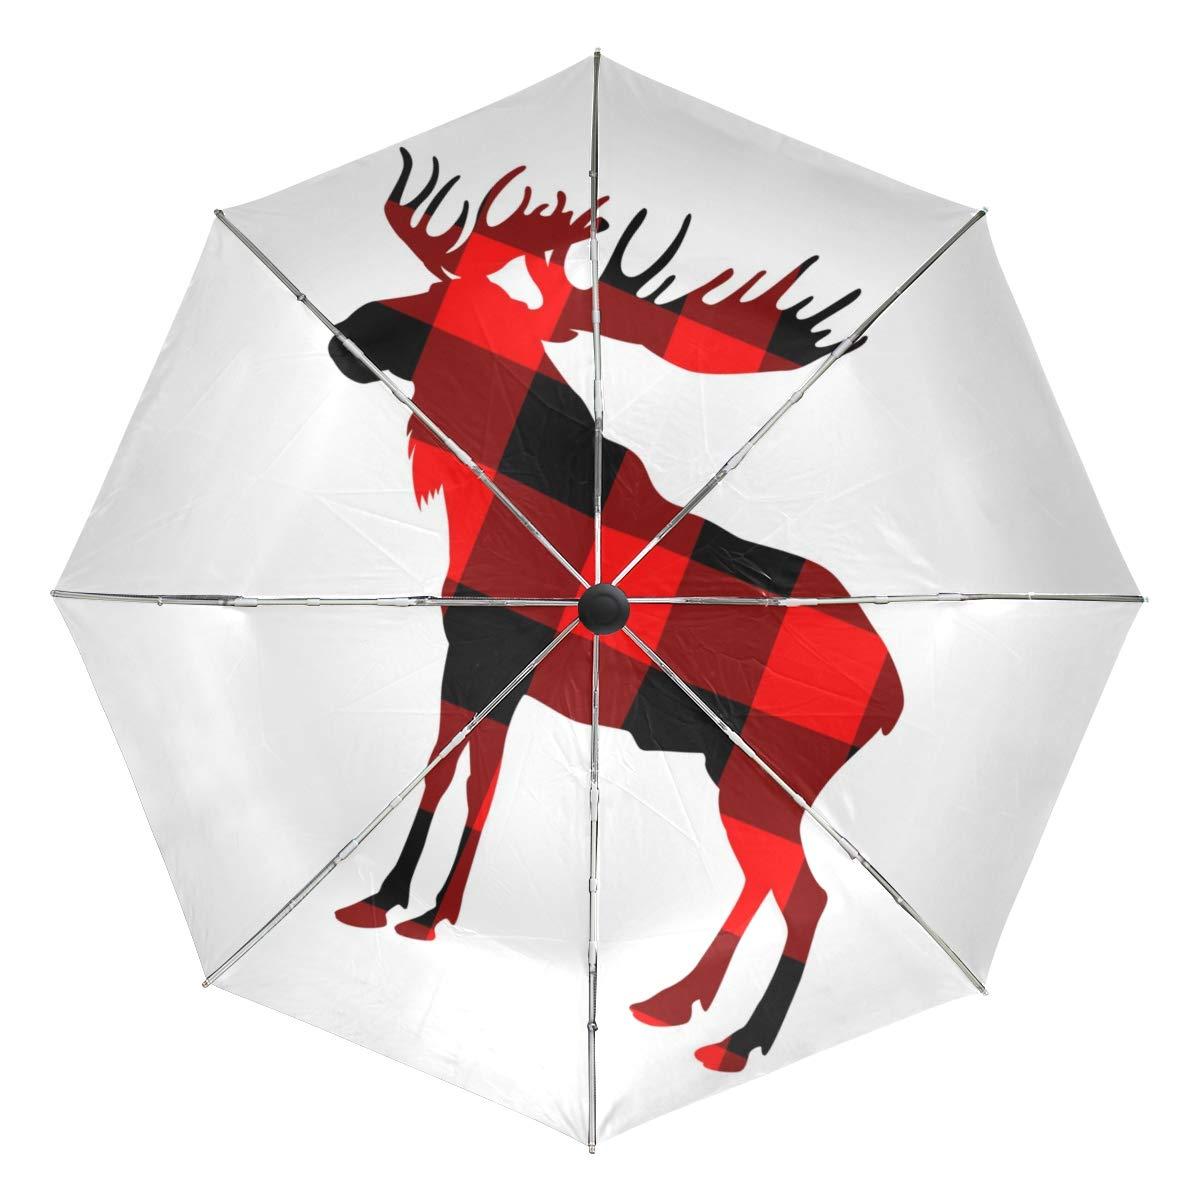 Golf Windproof Umbrella, Compact Auto Open Close Buffalo Plaid Moose Travel Umbrella